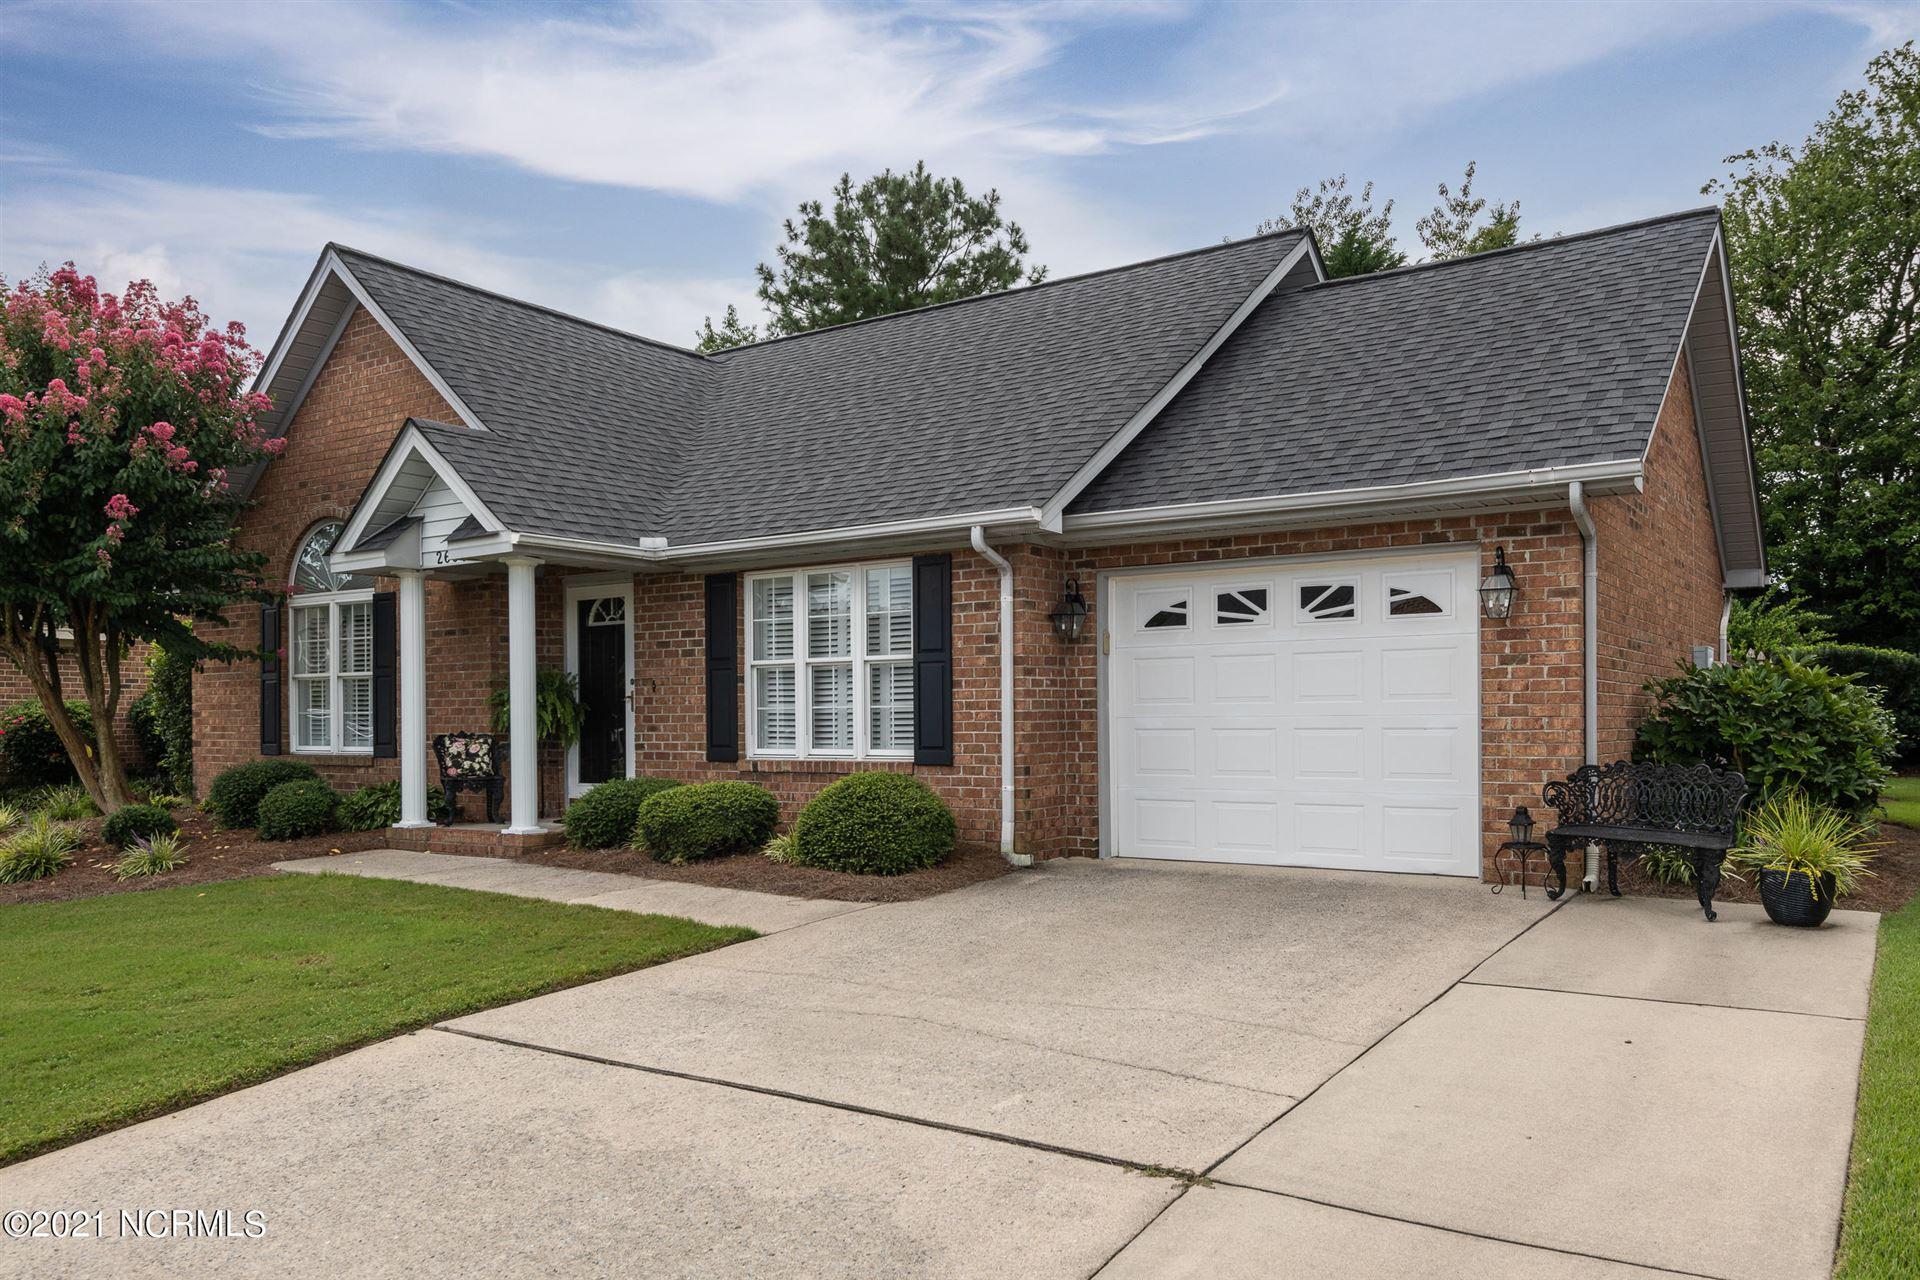 Photo of 2604 Brookridge Circle, Greenville, NC 27858 (MLS # 100286668)